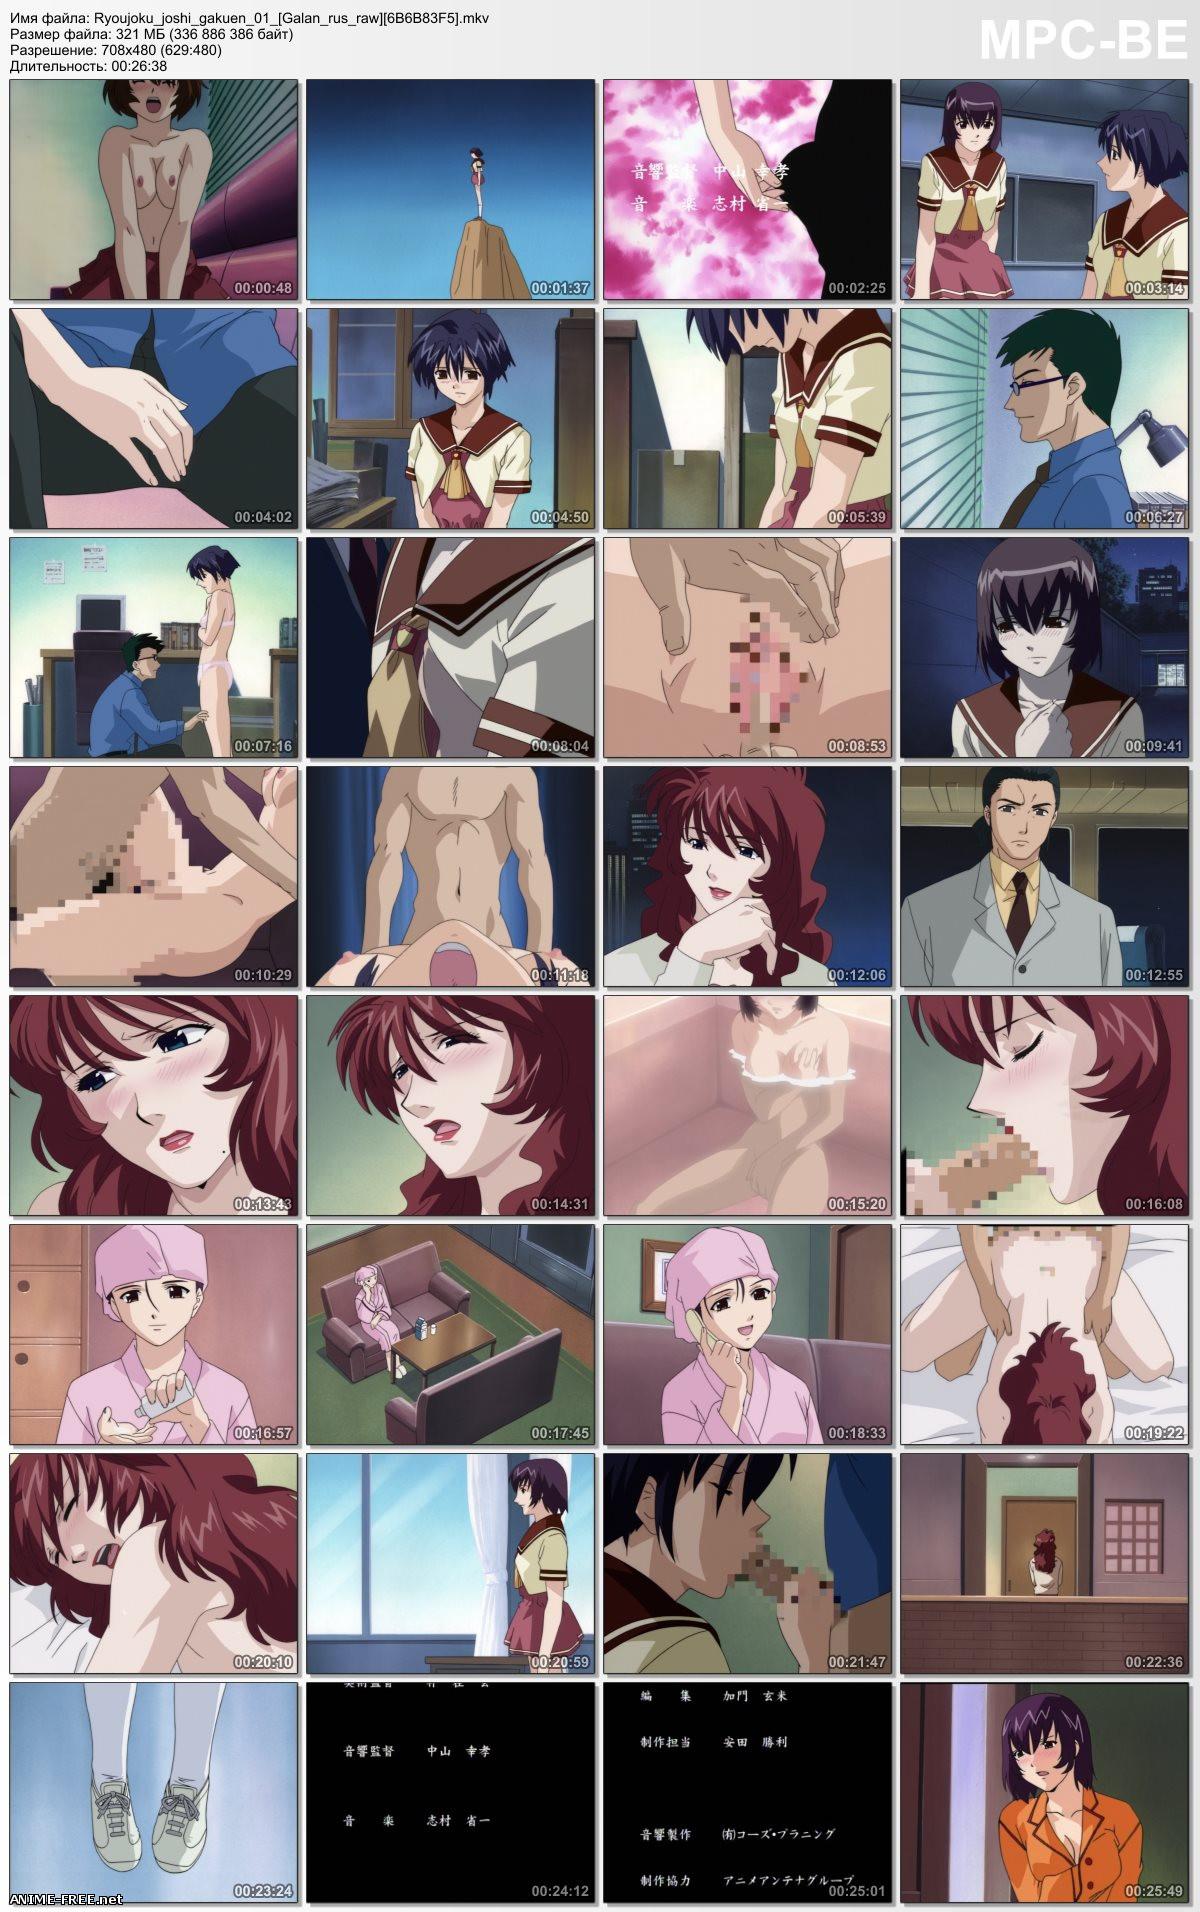 Ryoujoku Joshi Gakuen / Школа унижения девушки [Ep.1-2] [JAP,RUS,CHI,ENG,KOR] Anime Hentai